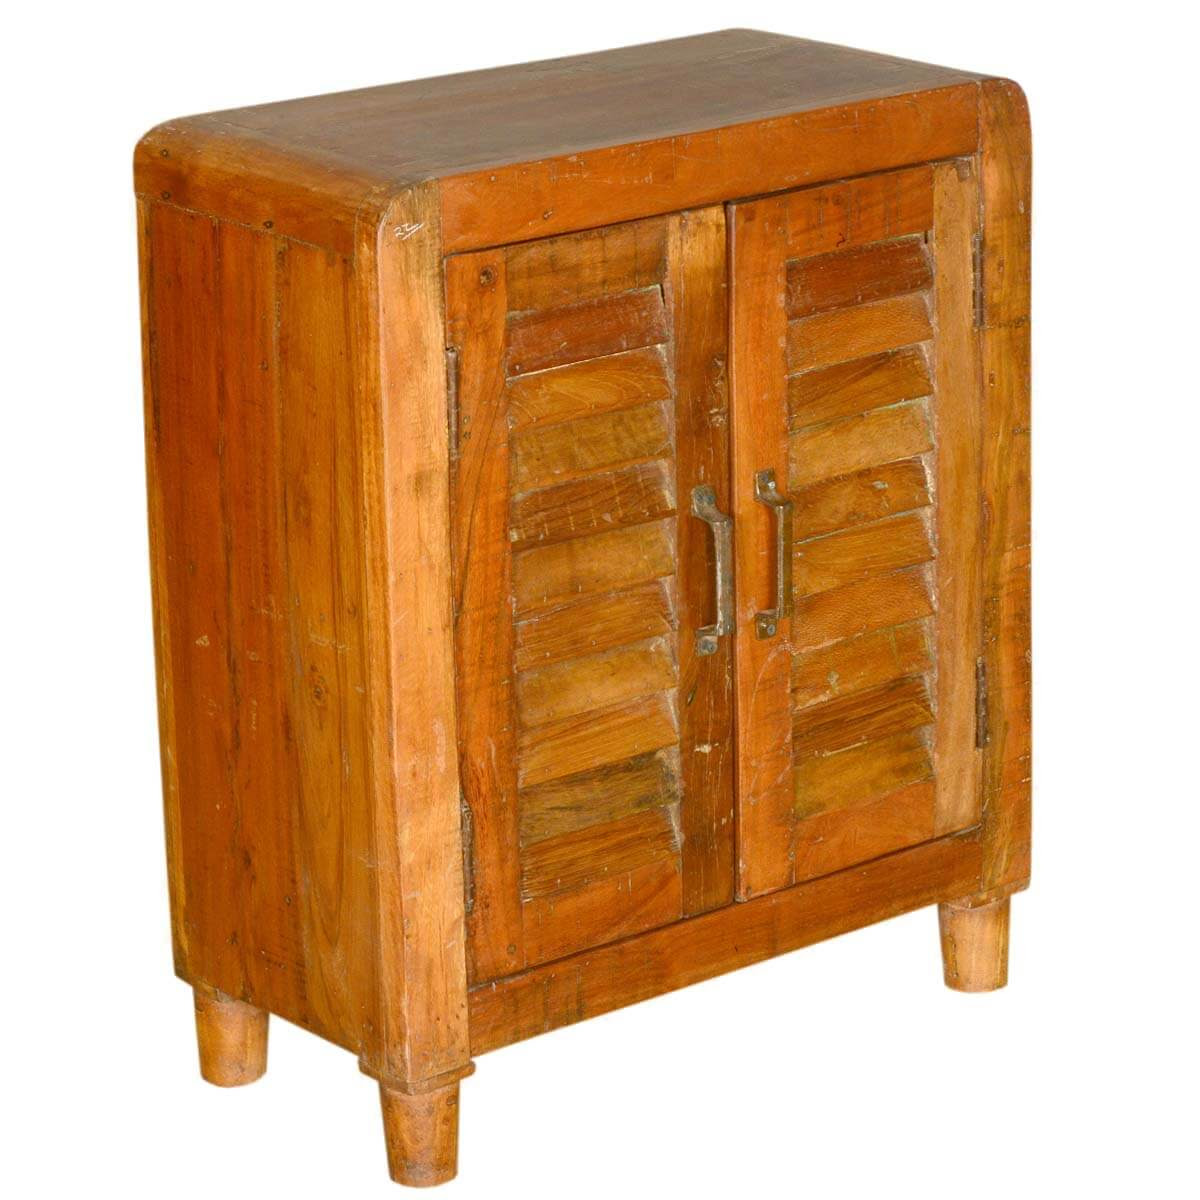 Ventnor Farmhouse Shutter Door Reclaimed Wood Storage ...